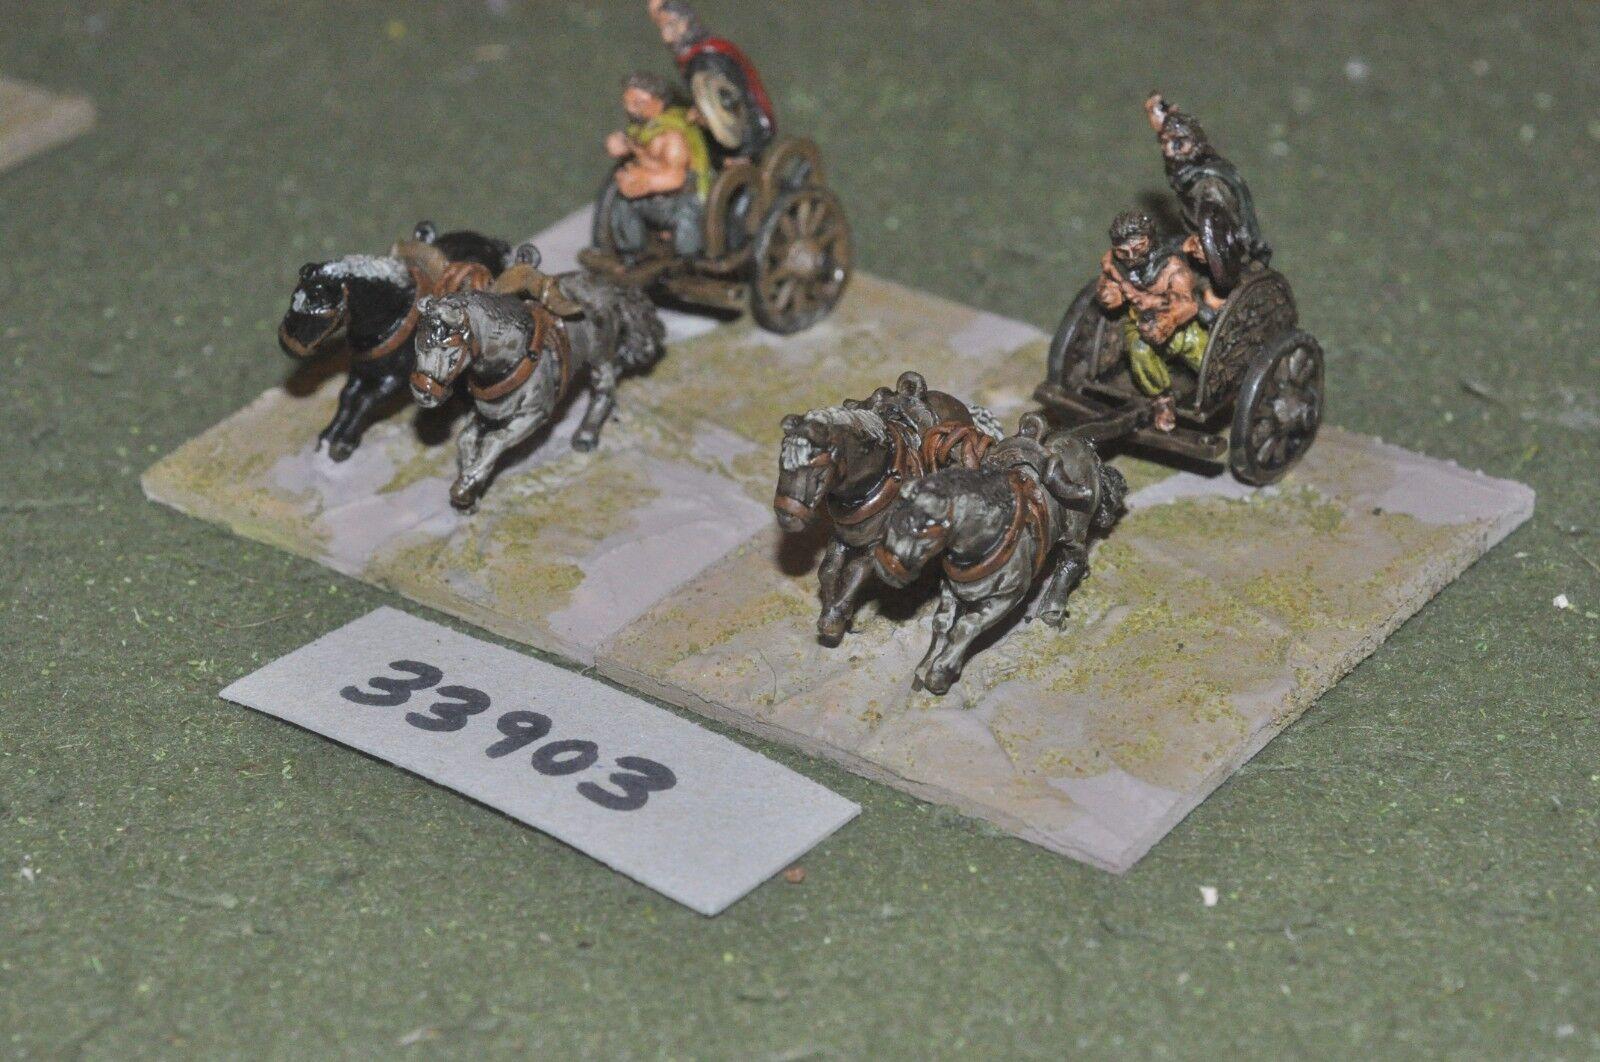 25mm roman era   gaul - 2 light - chariots (33903)